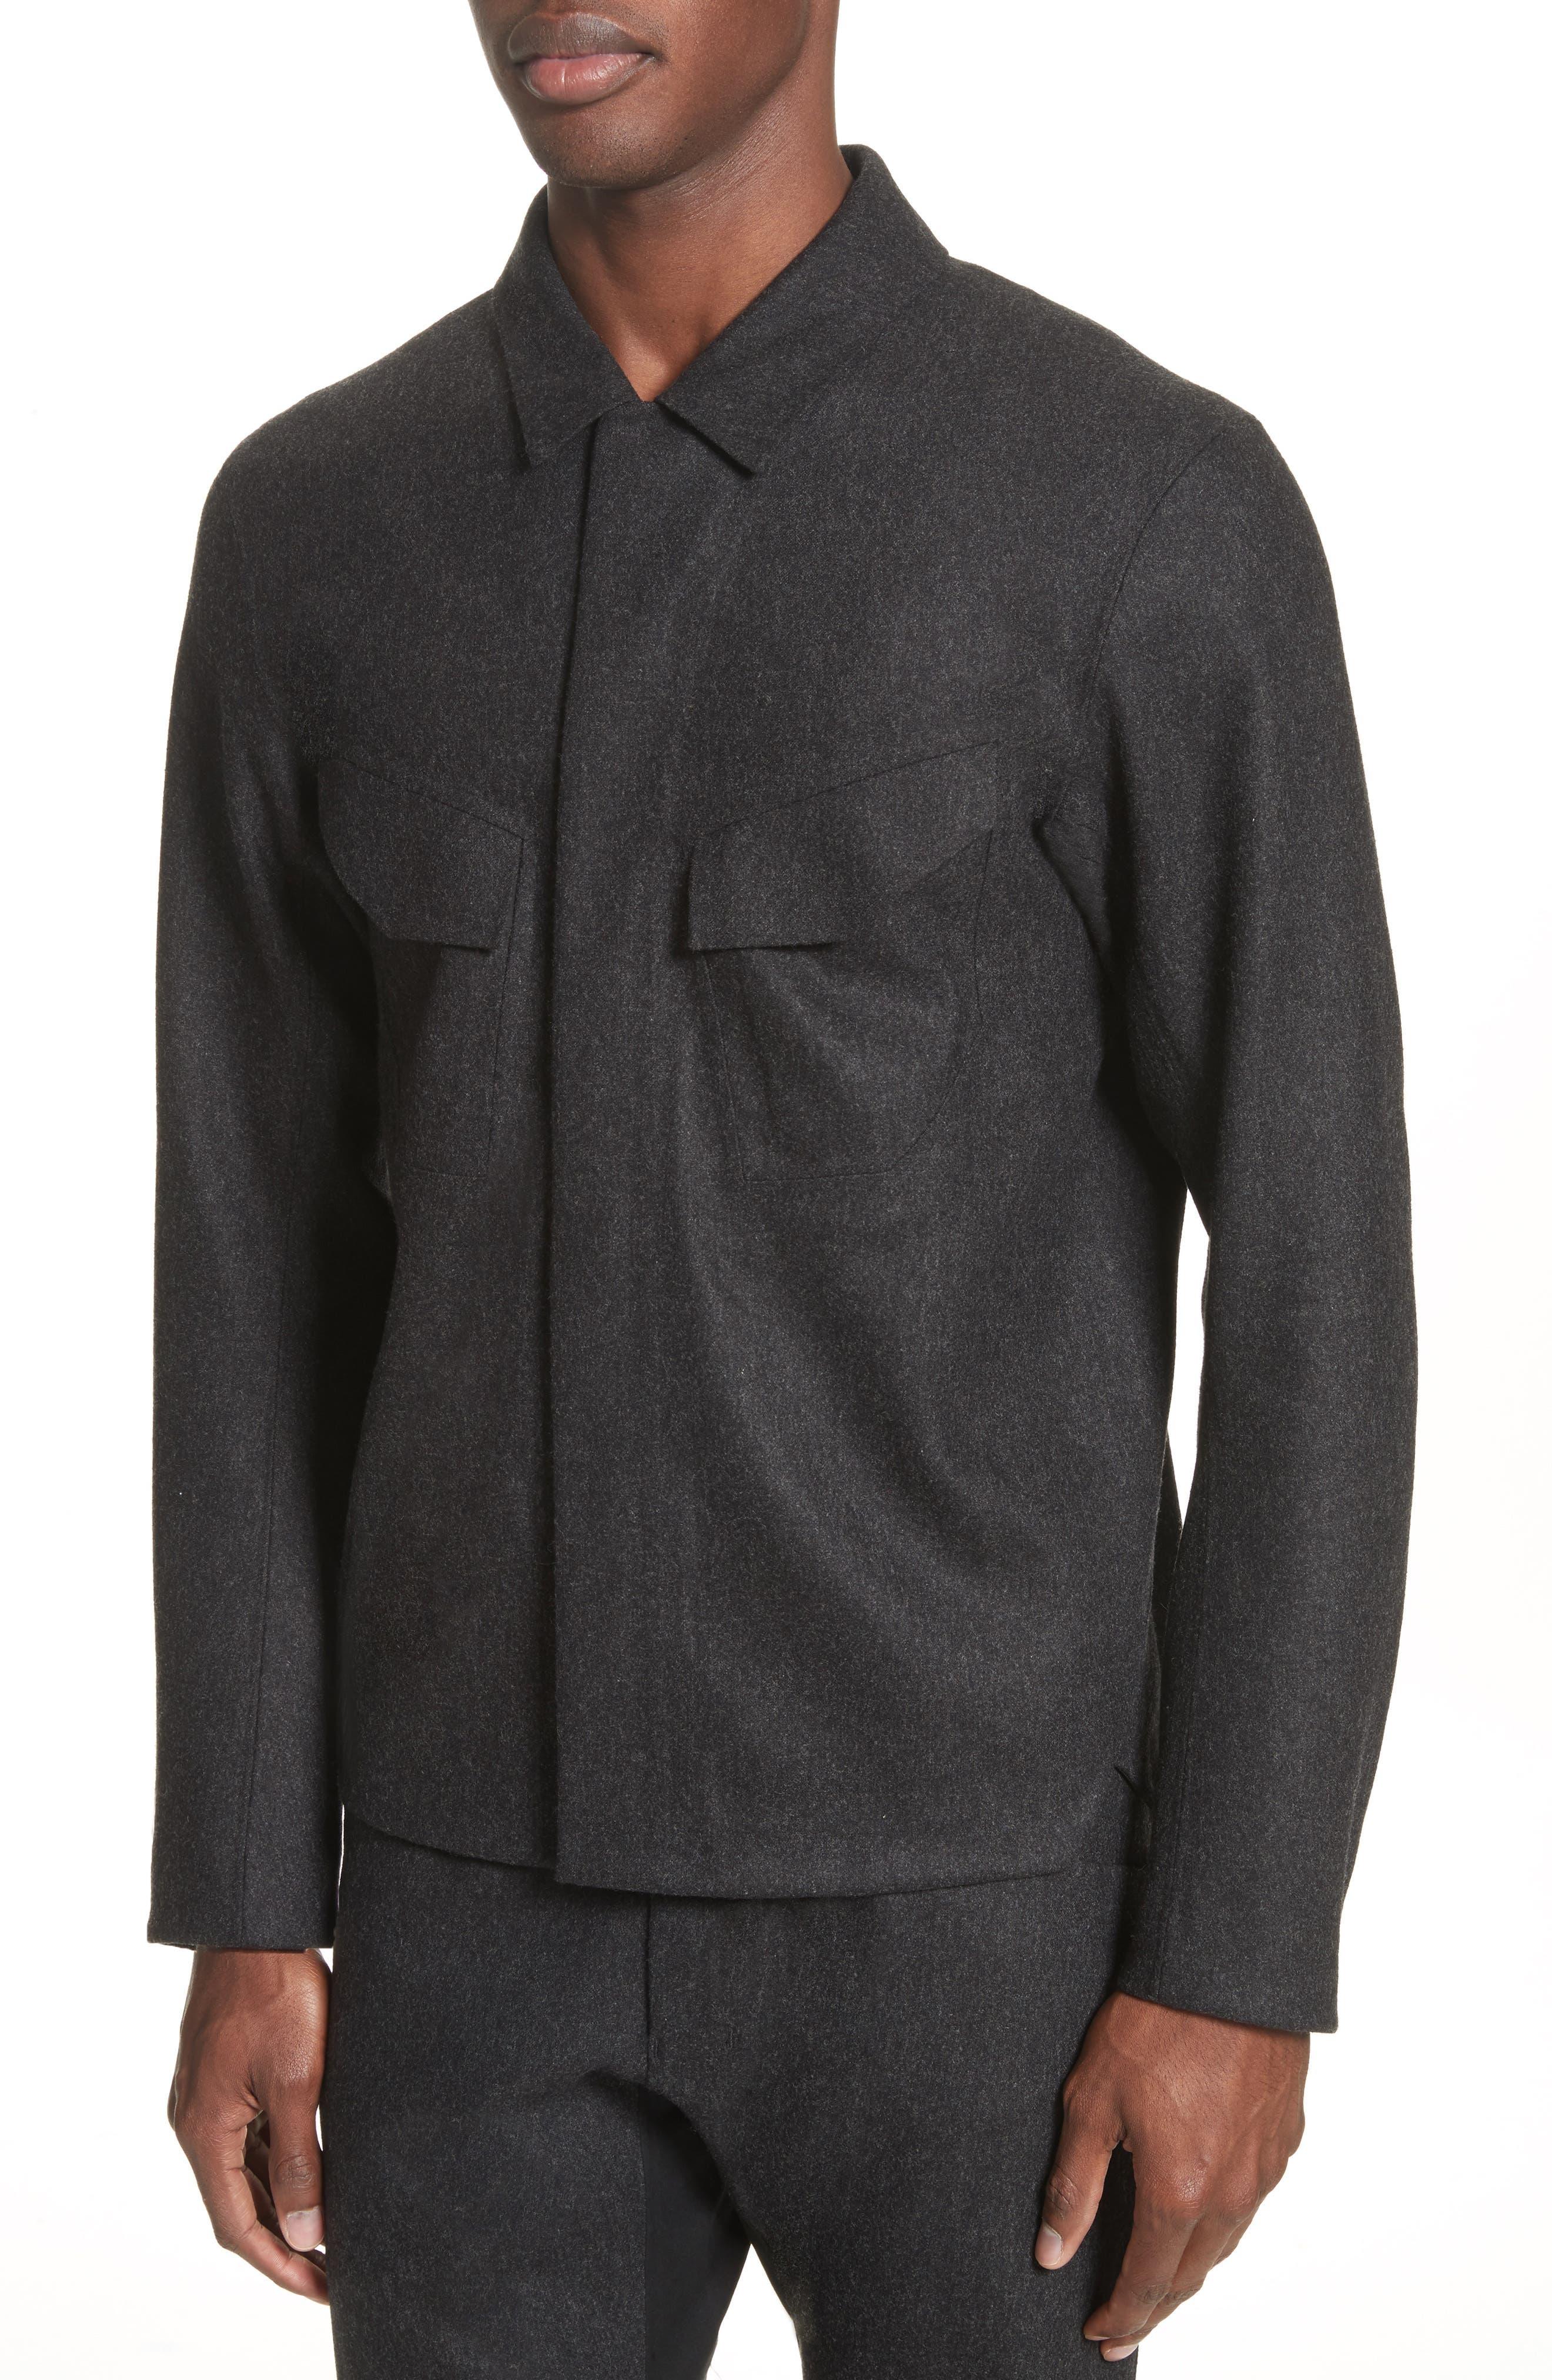 Haedn Shirt Jacket,                             Alternate thumbnail 5, color,                             001